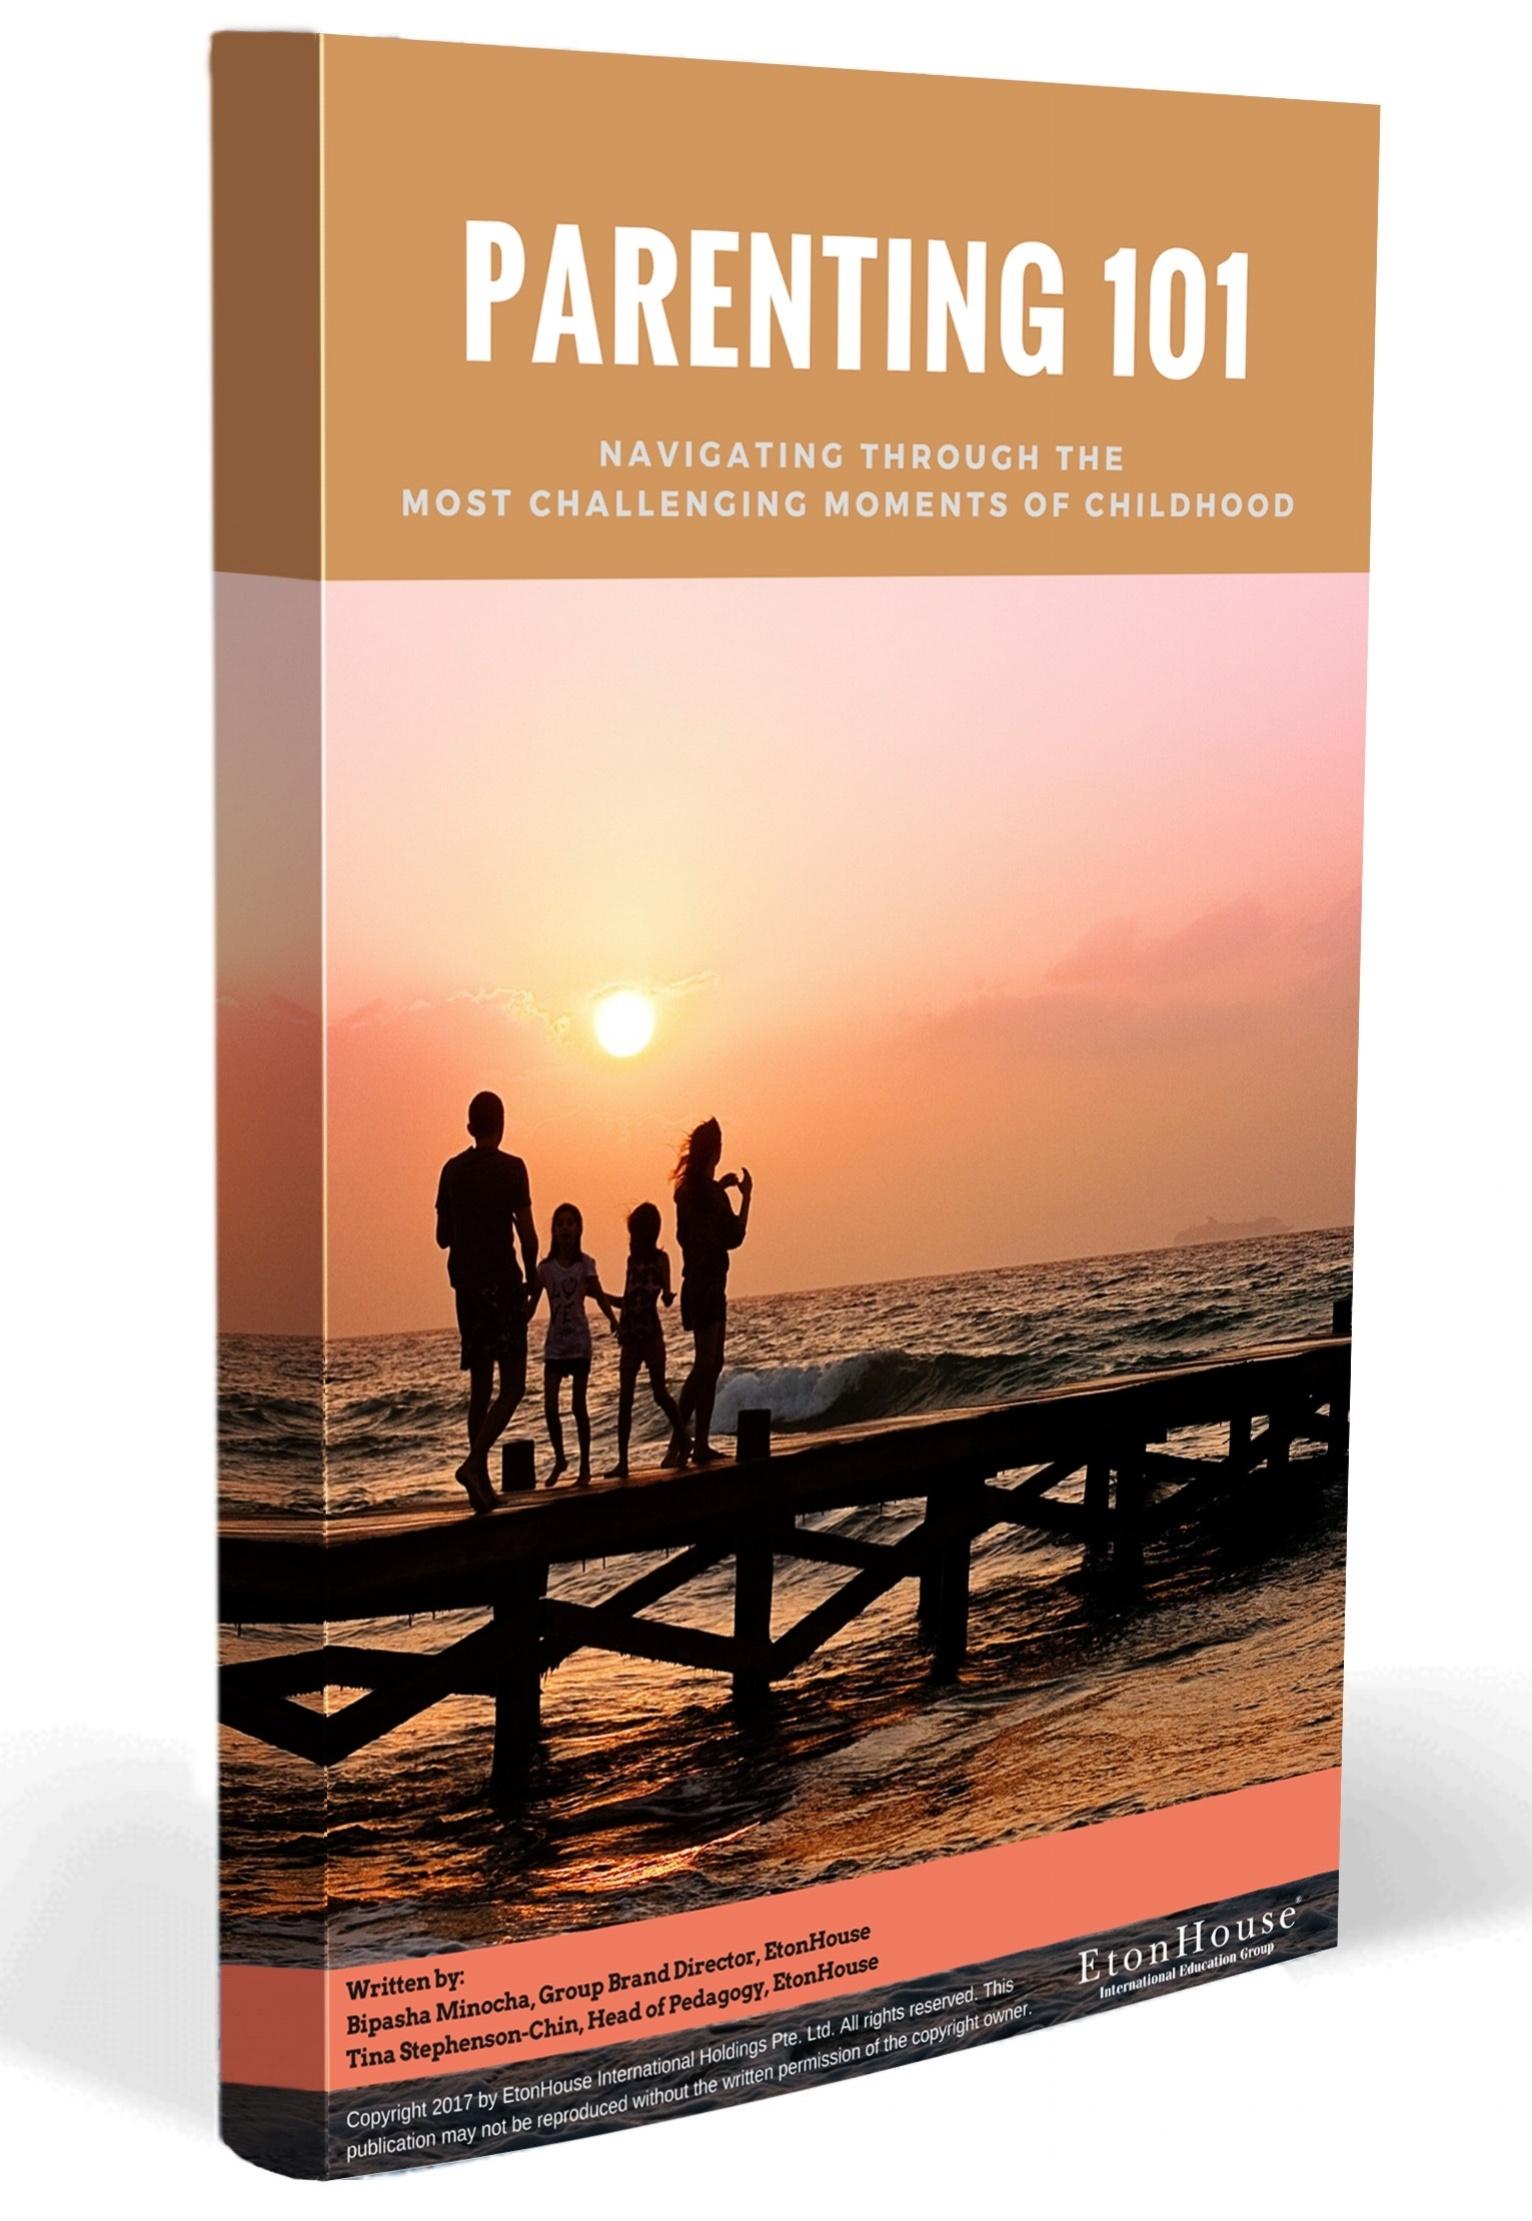 Parenting 101-1-086639-edited.jpg